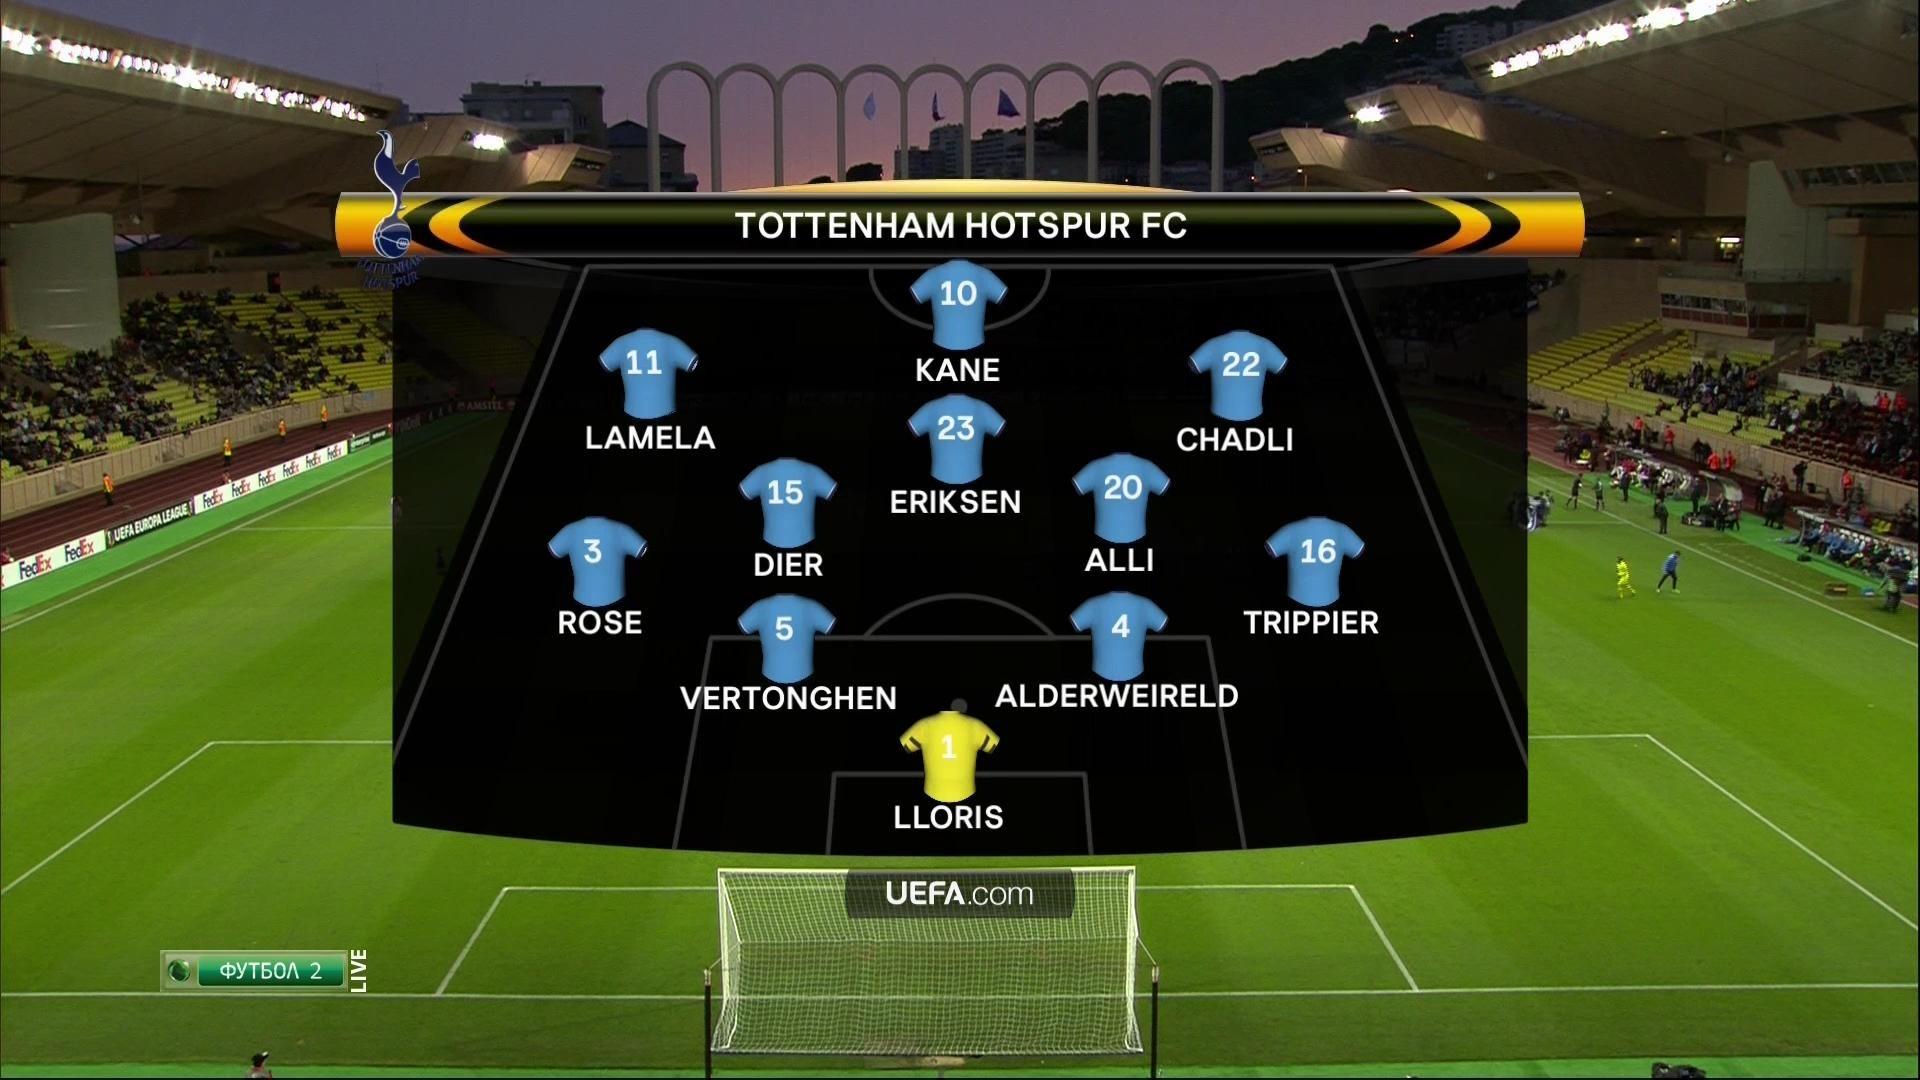 Tottenham Hotspur Wallpaper #756